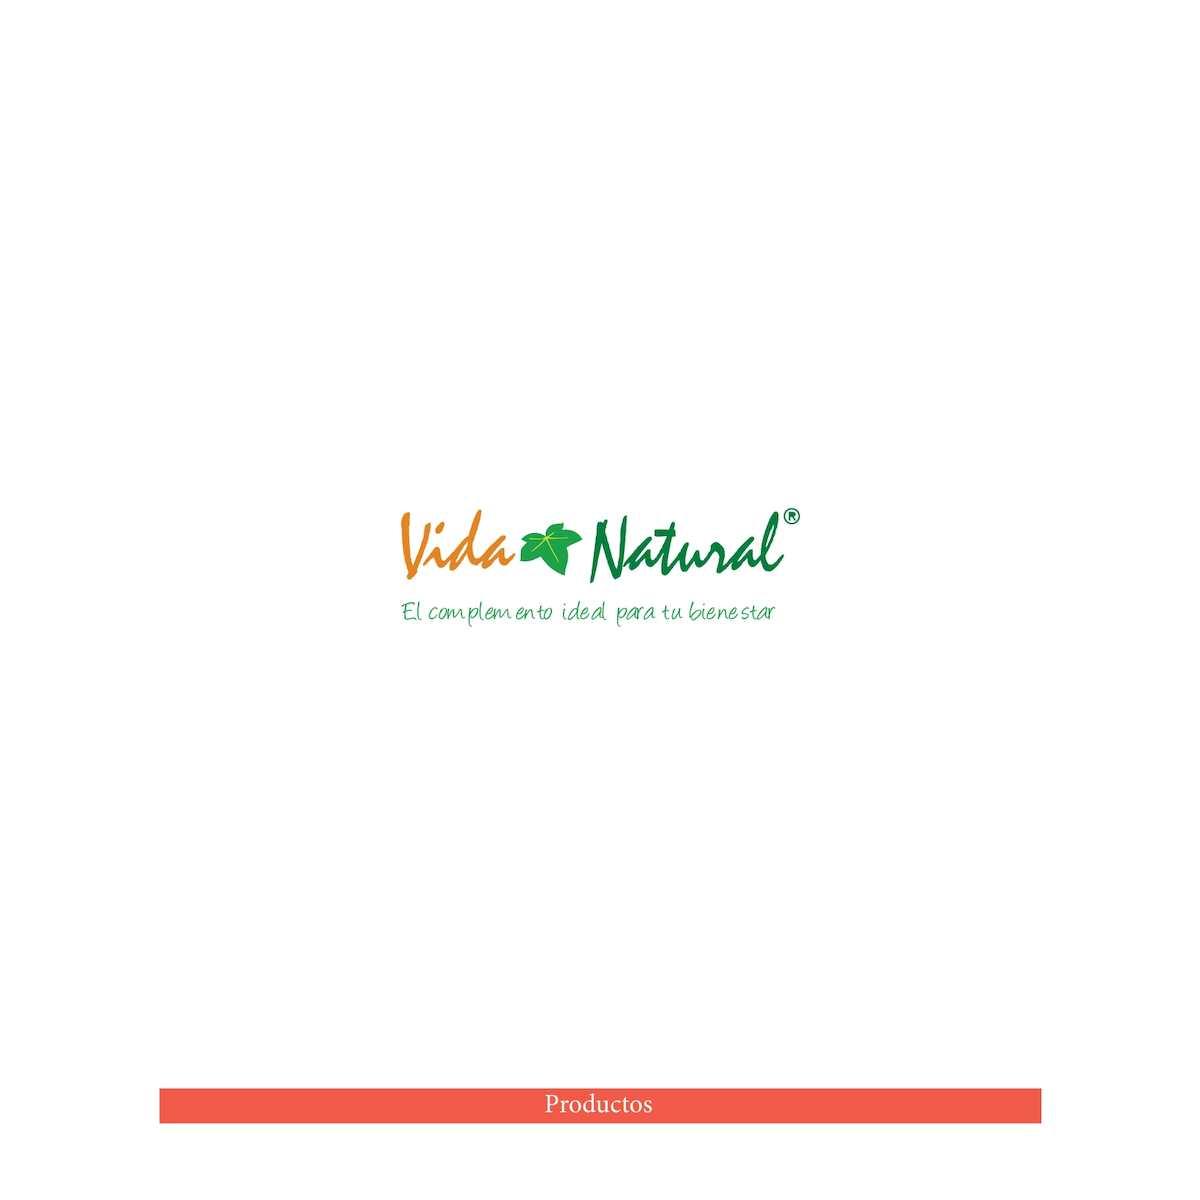 Catálogo Vida natural